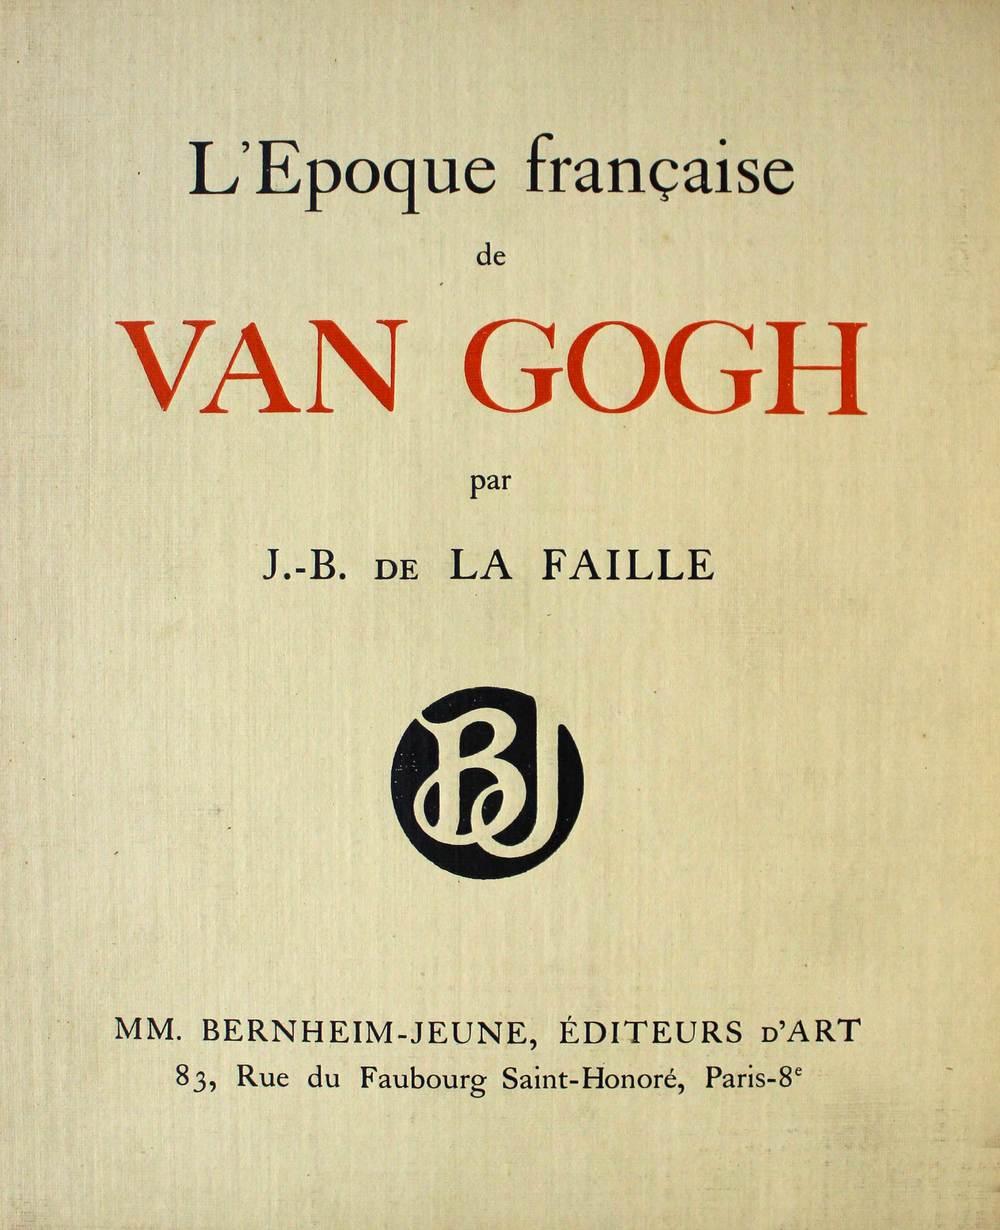 V.VanGogh-ed-Bernheim-Jeune.jpg